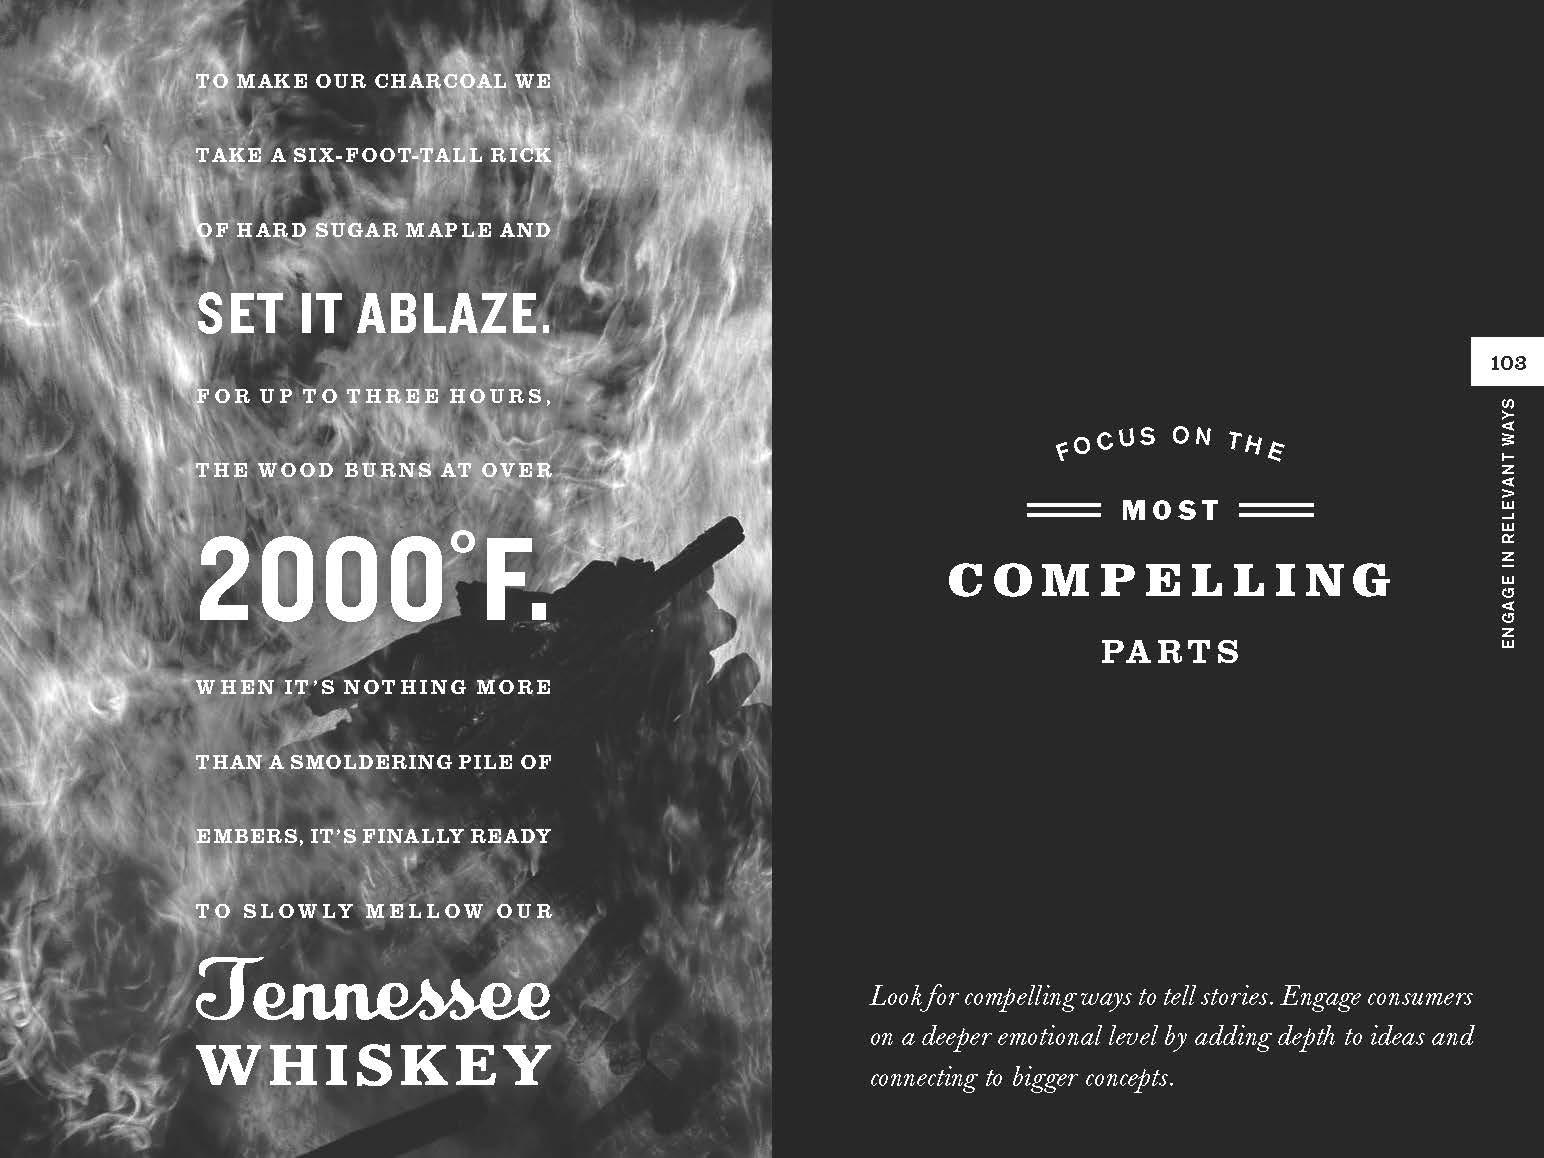 Jack Daniel's Guiding Principles 2012_Page_55.jpg